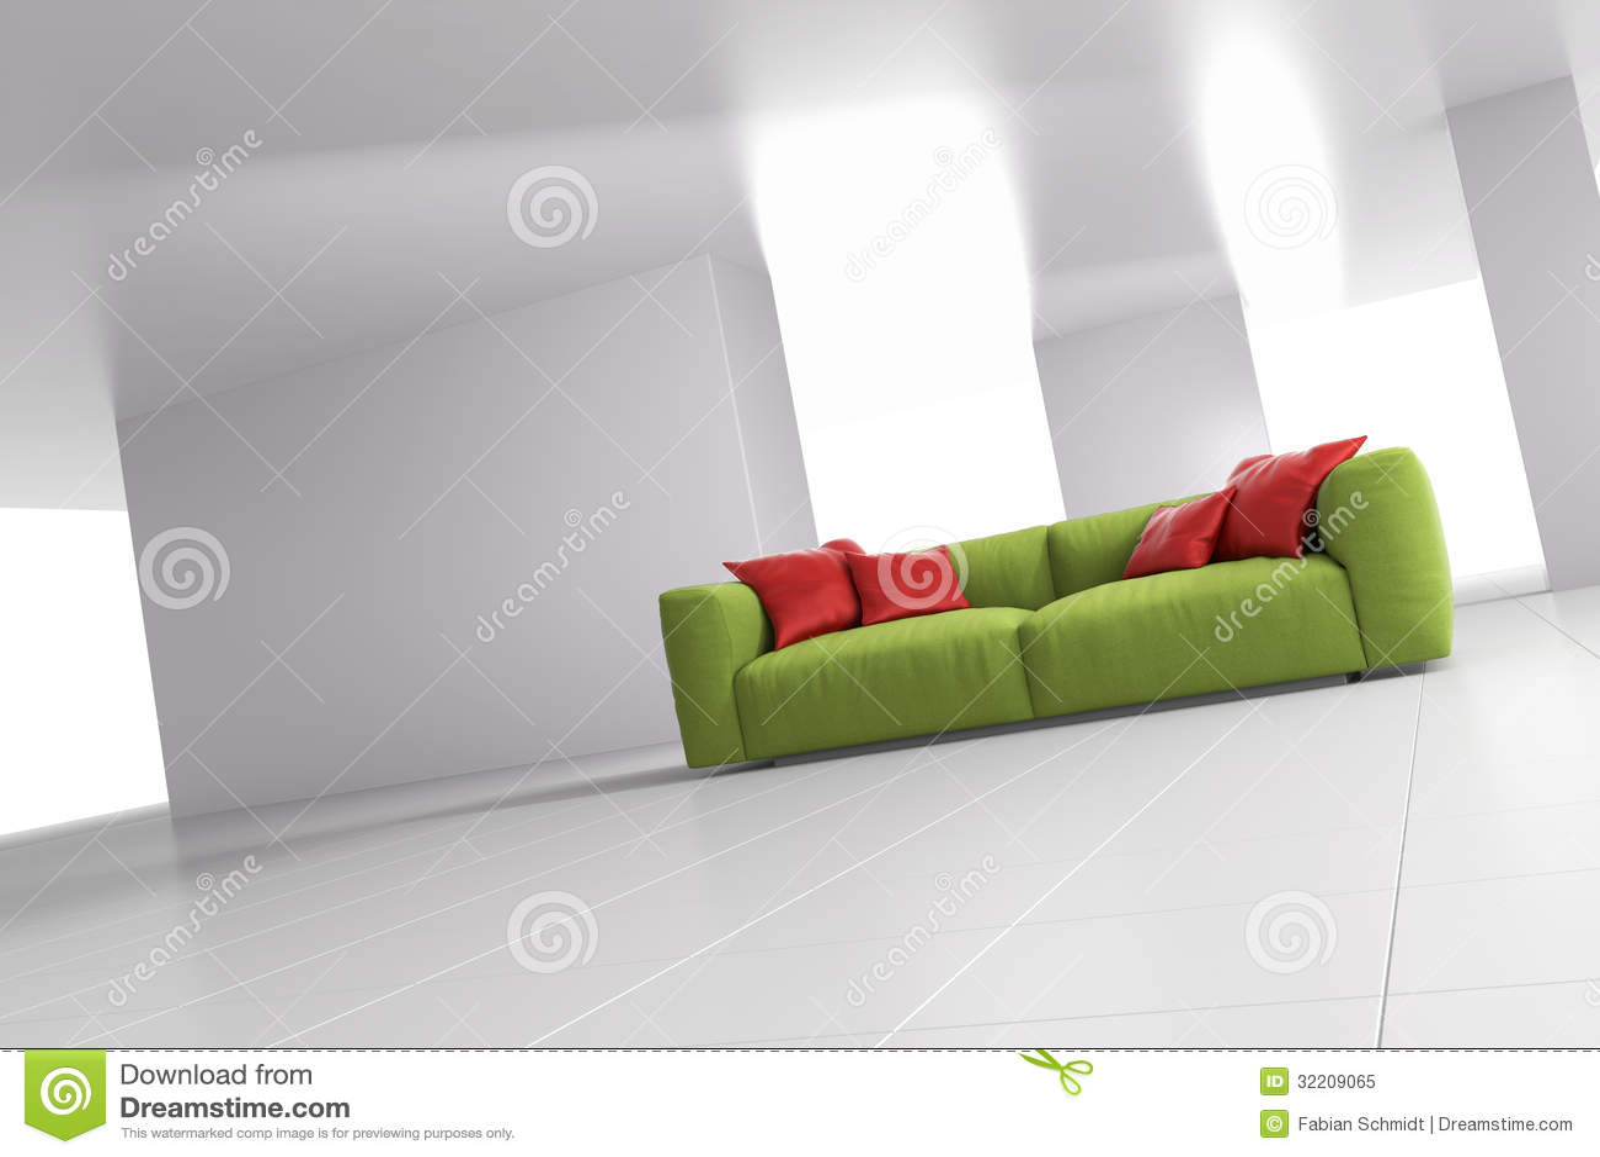 Sofa vert dans la chambre lumineuse angulaire photo libre de droits image 32209065 for La chambre verte truffaut download